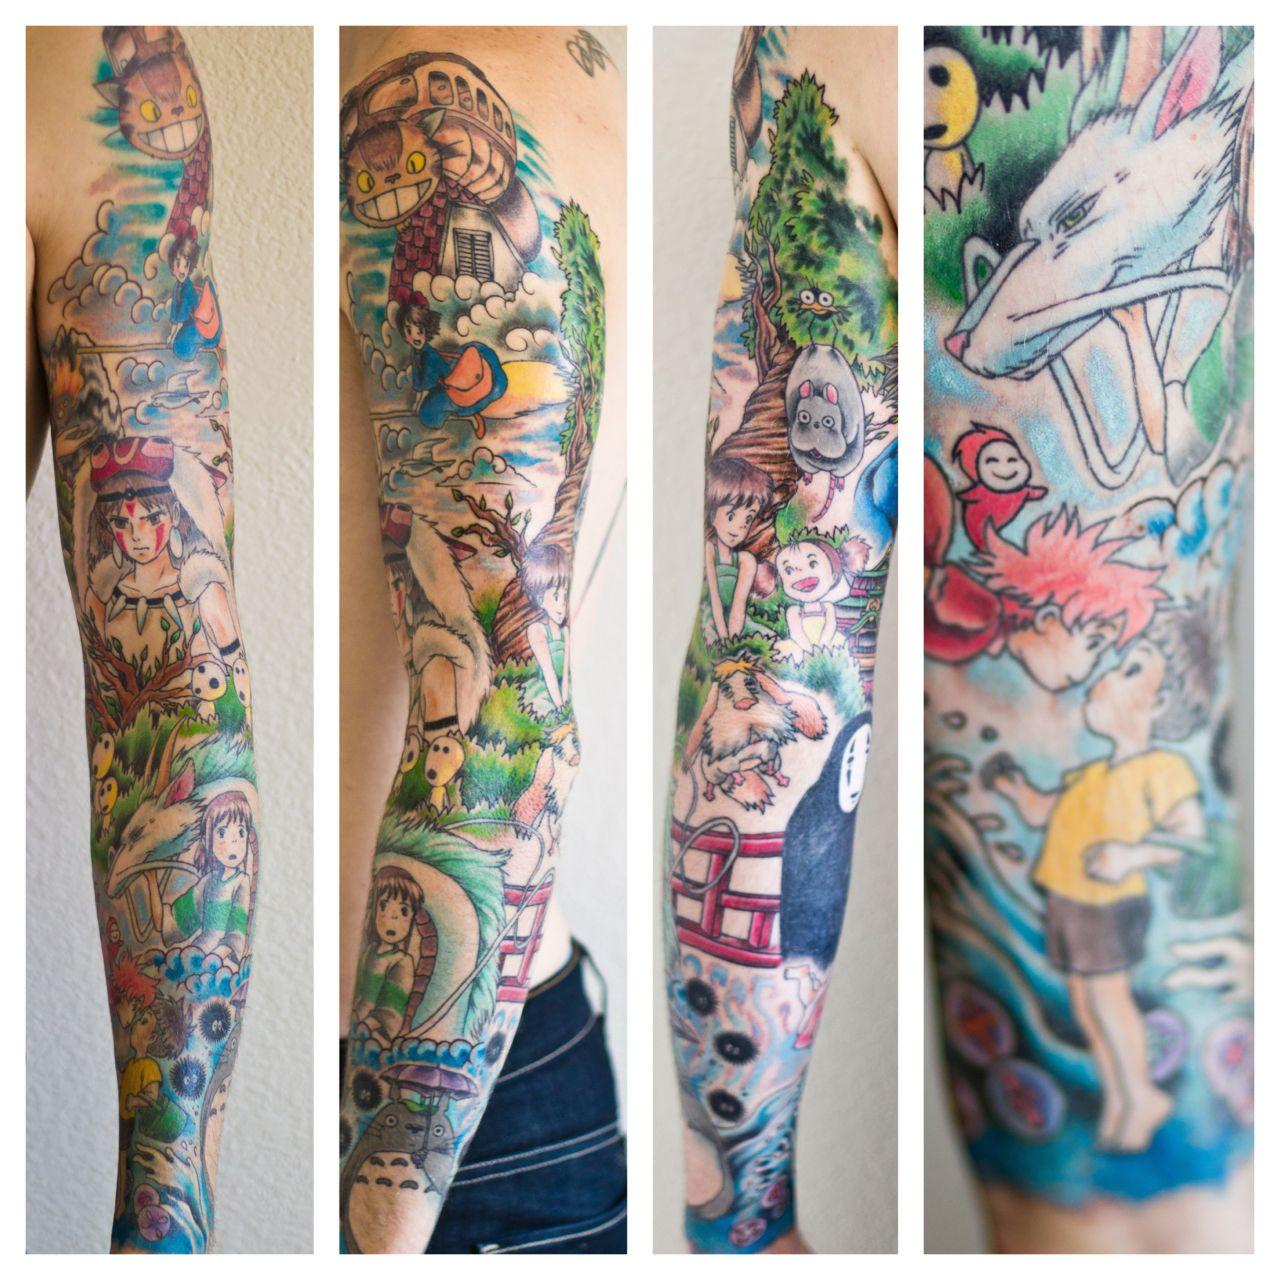 my miyazaki sleeve done by kimberly wall at classic tattoo on kim wall id=94607